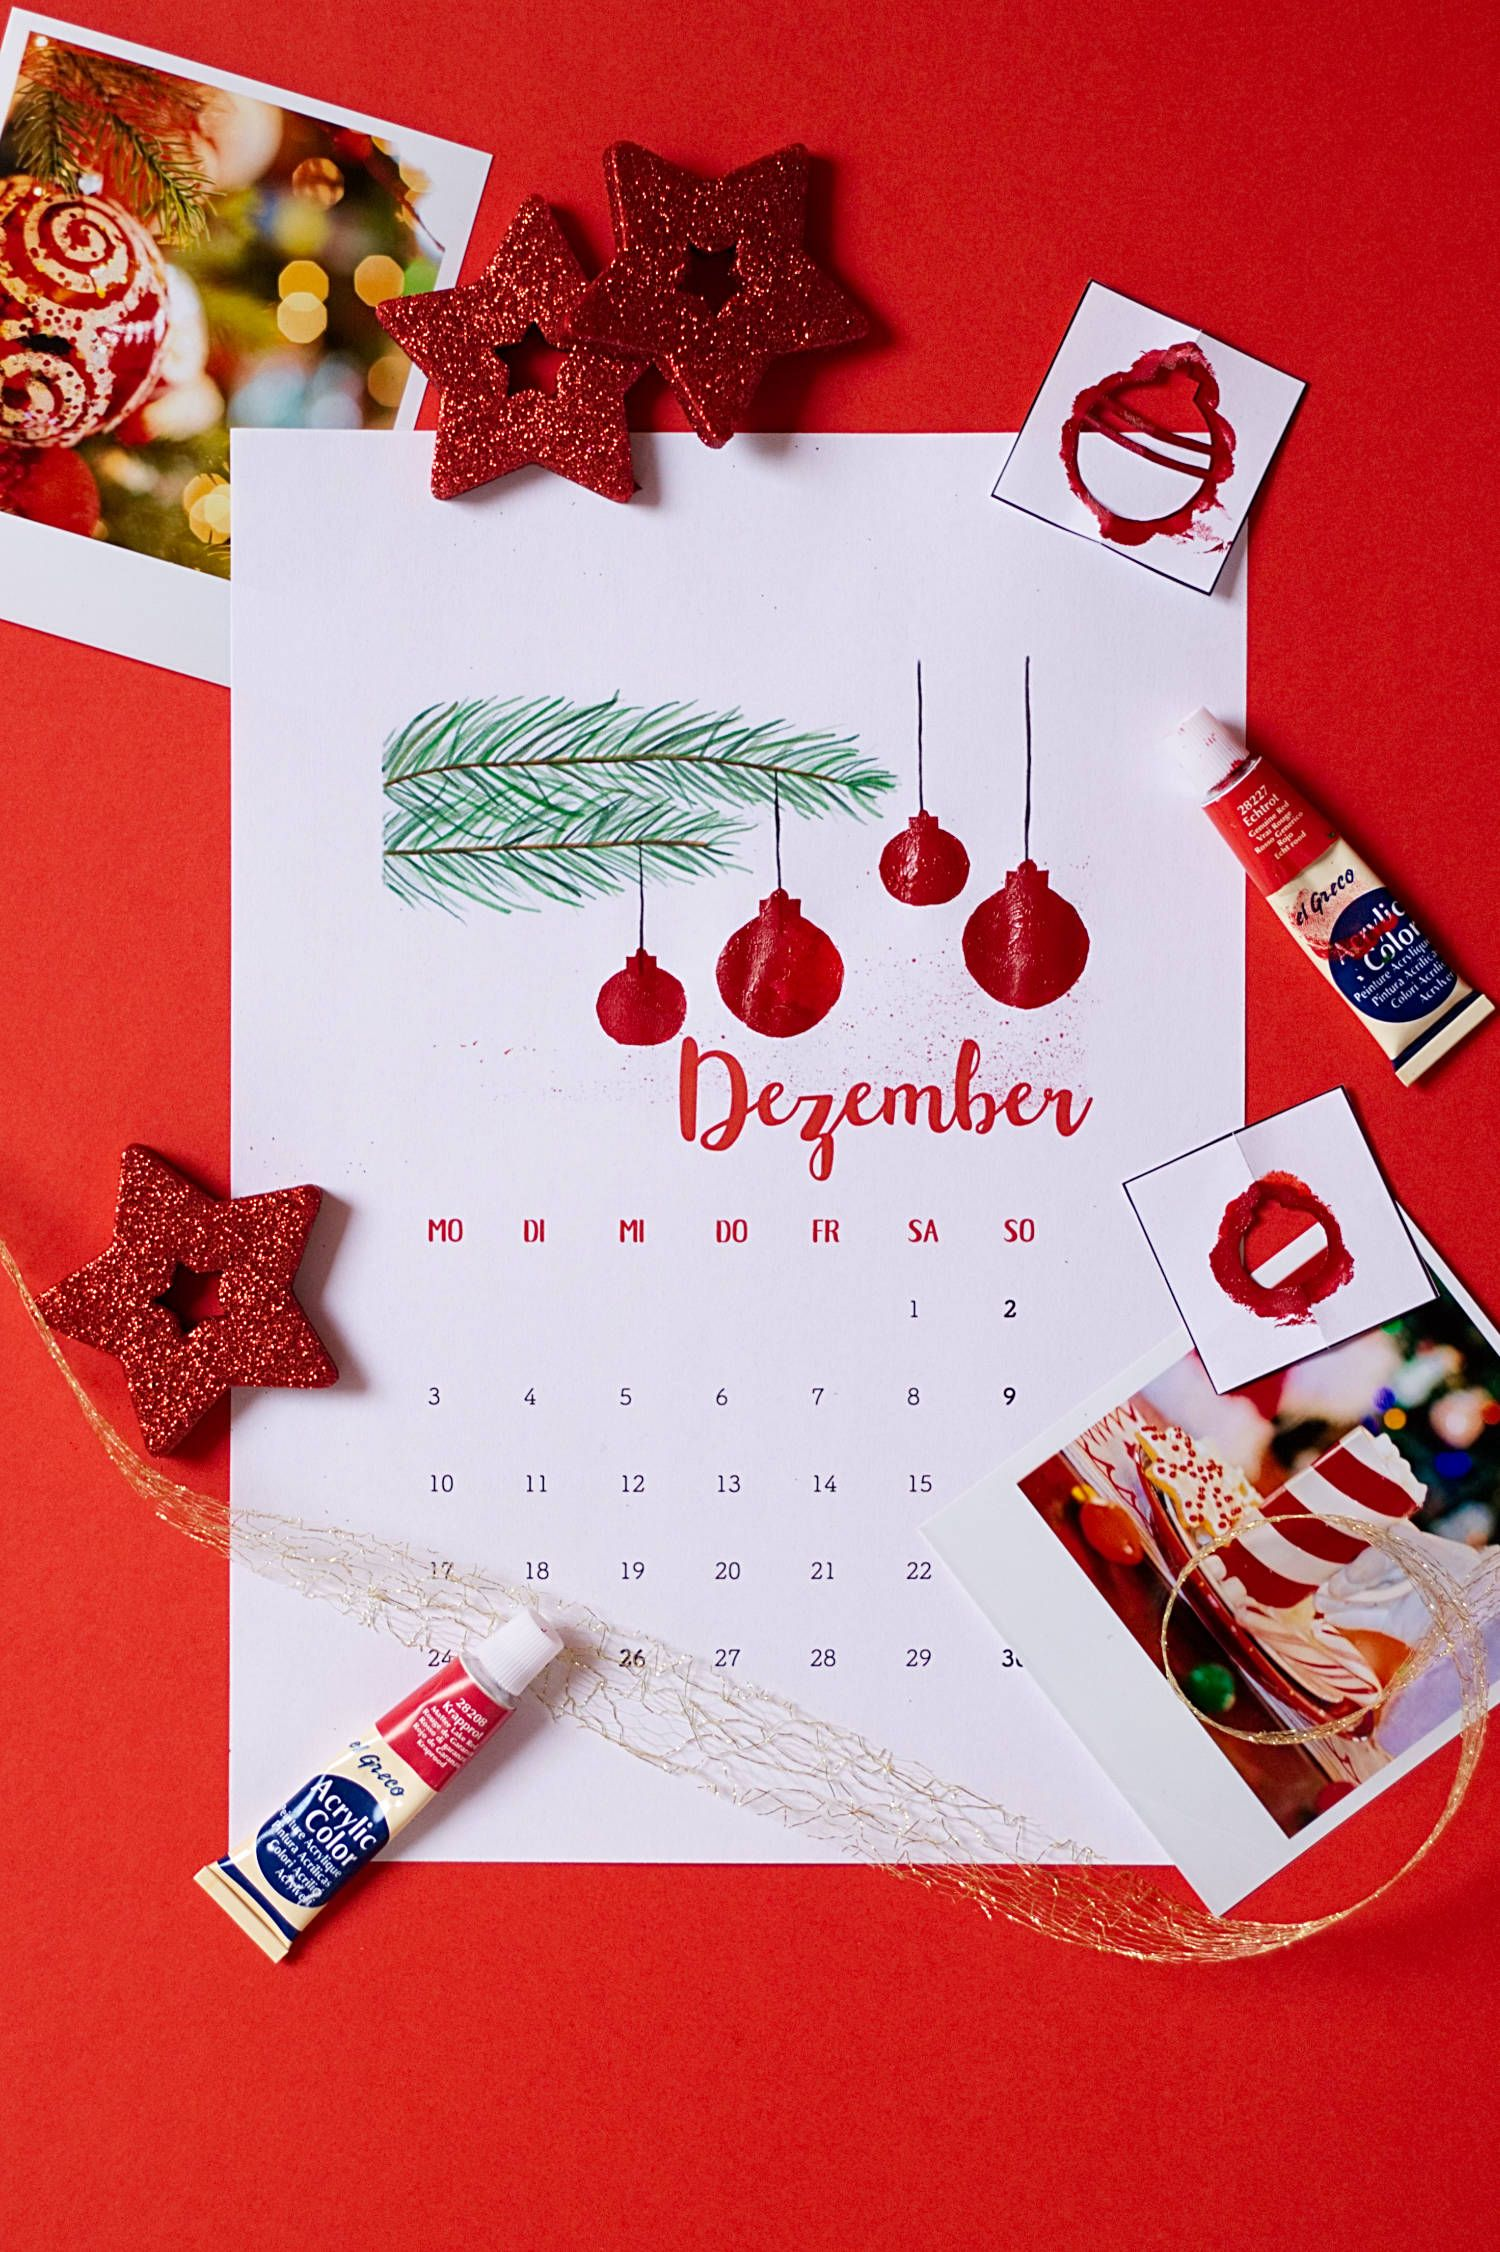 Dezember - Kalender 2018 zum Fingerstempeln